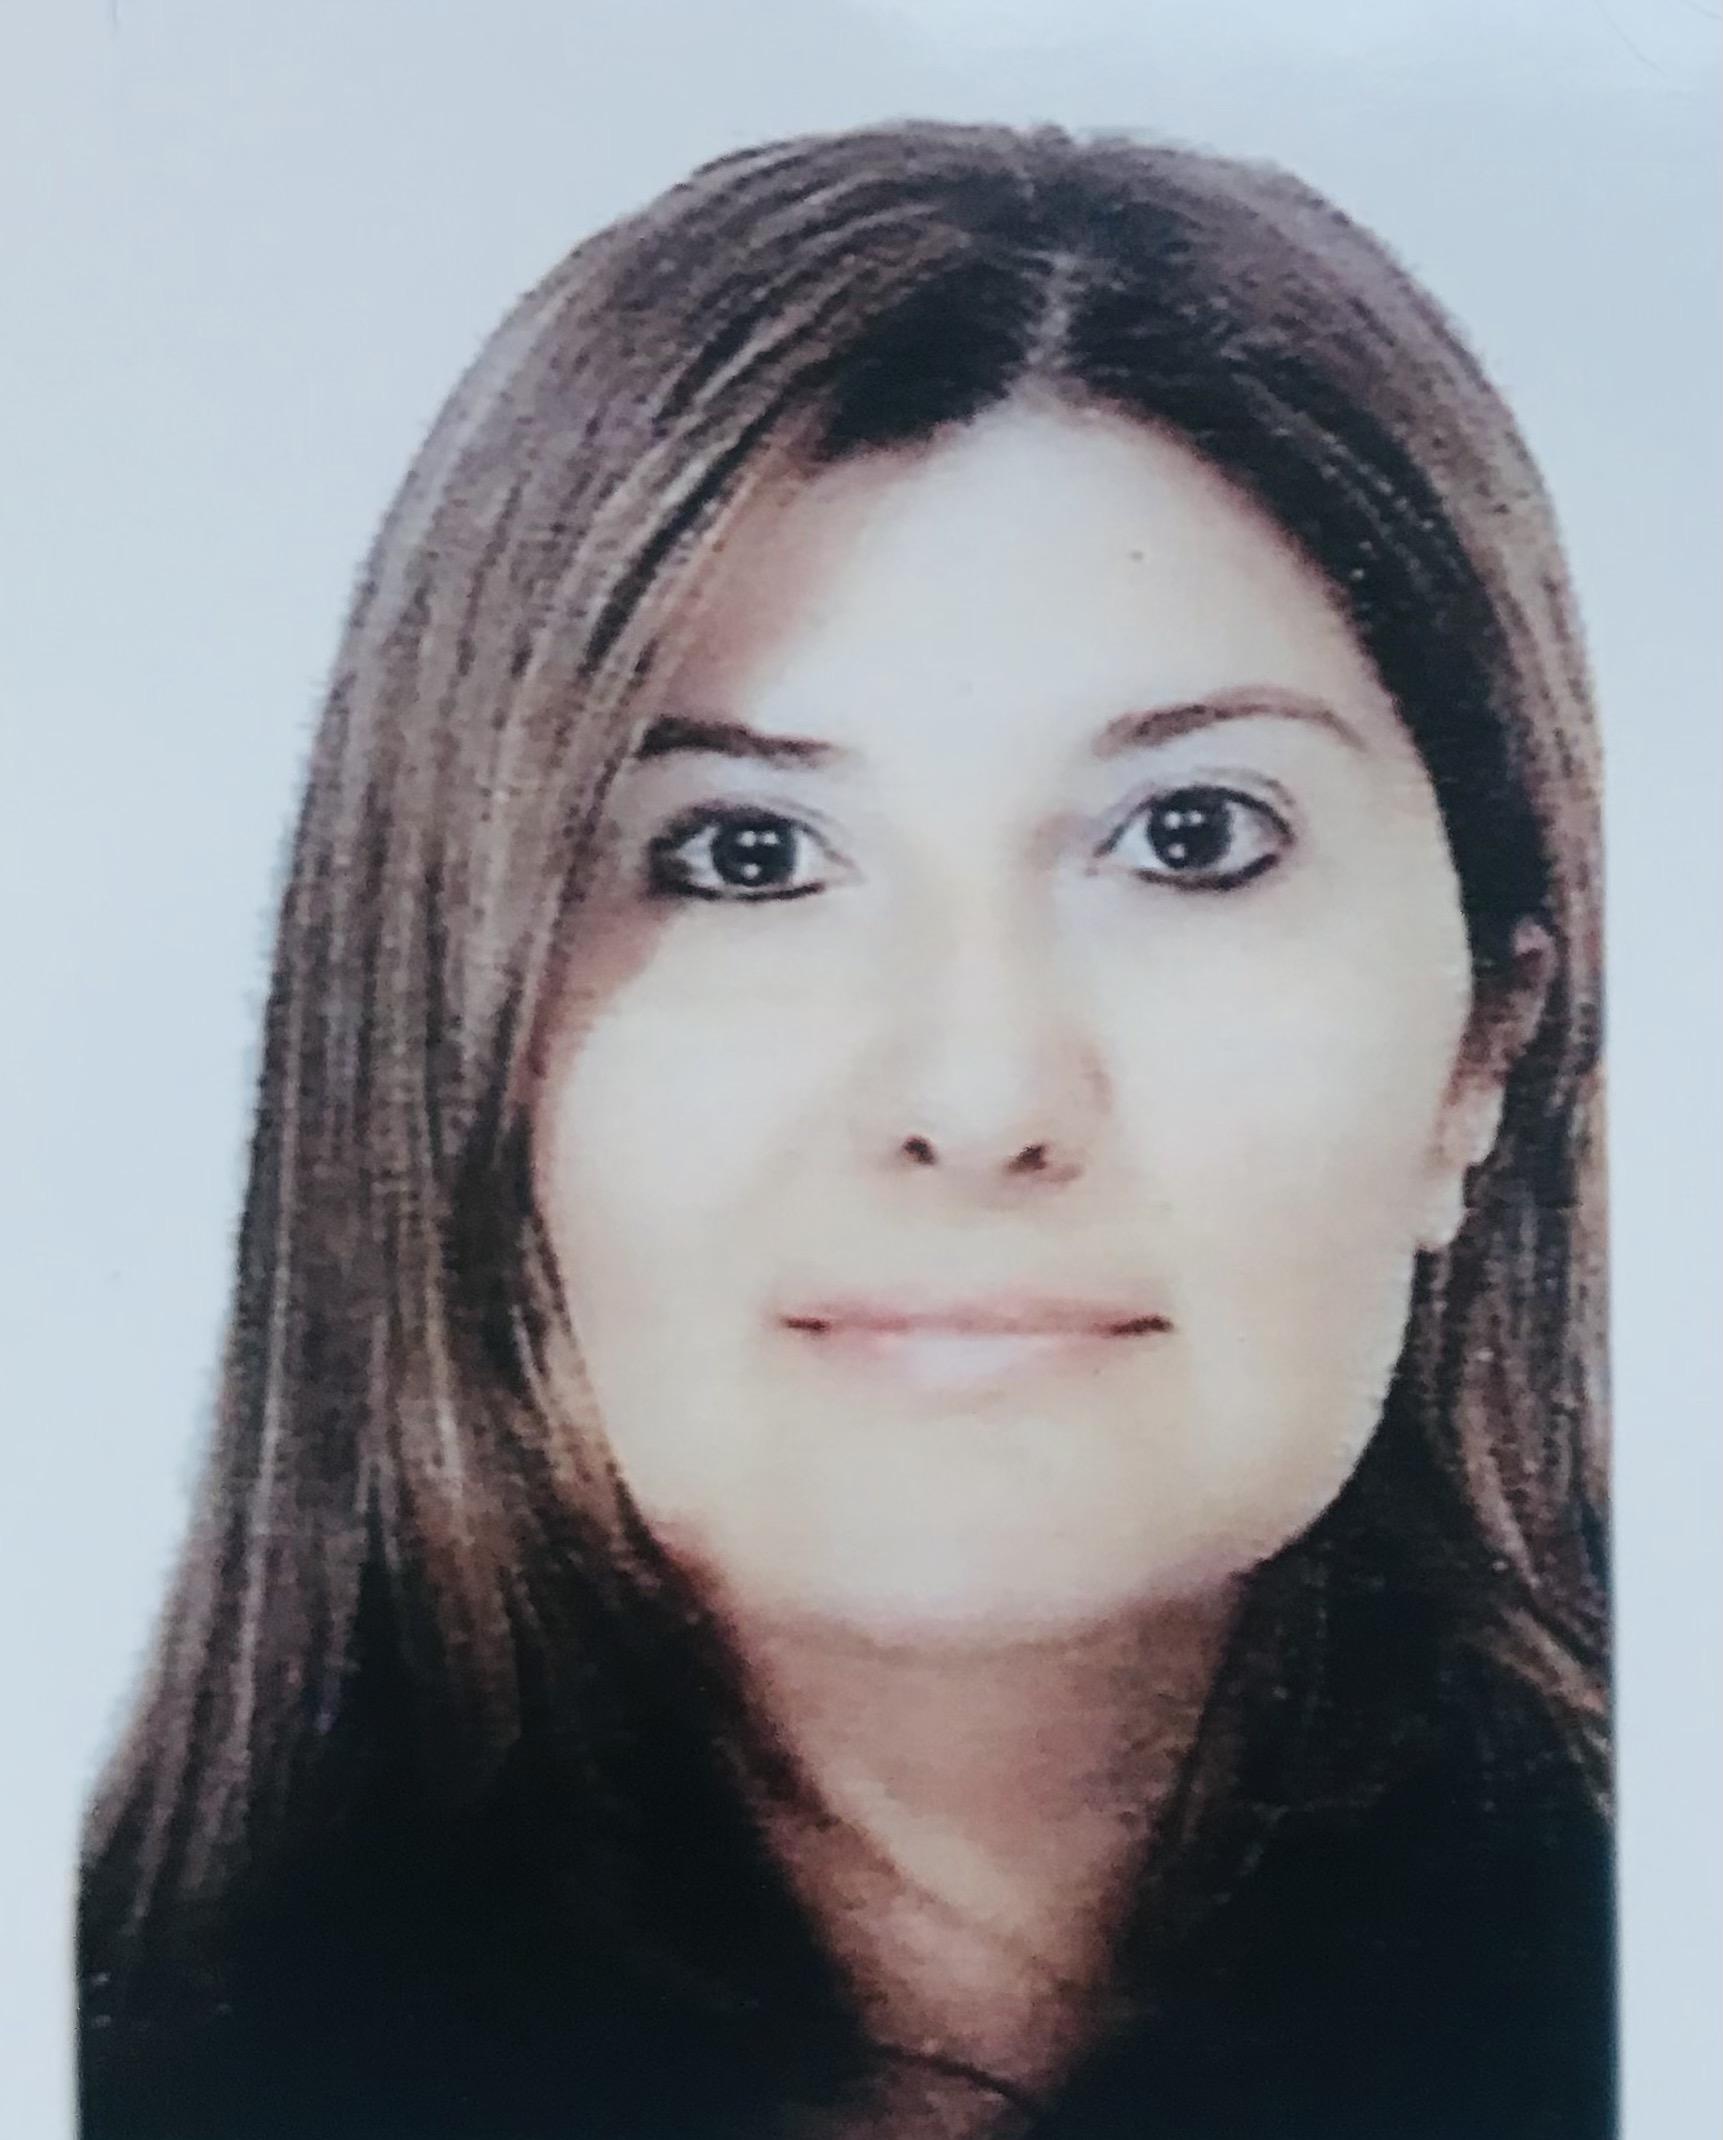 Simona Vocaturo